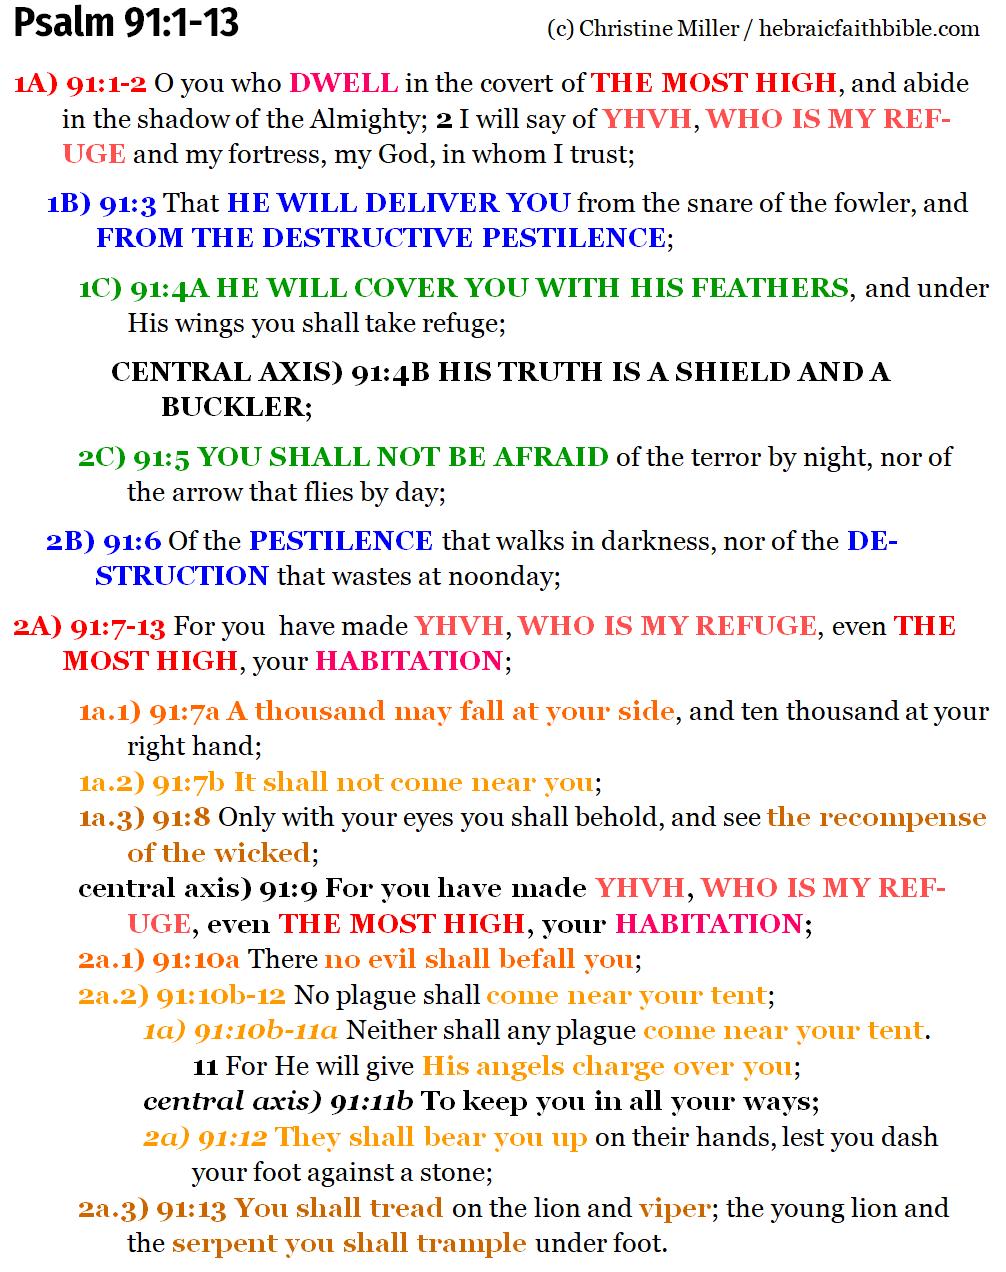 Psalm 91:1-13 chiasm | hebraicfaithbible.com